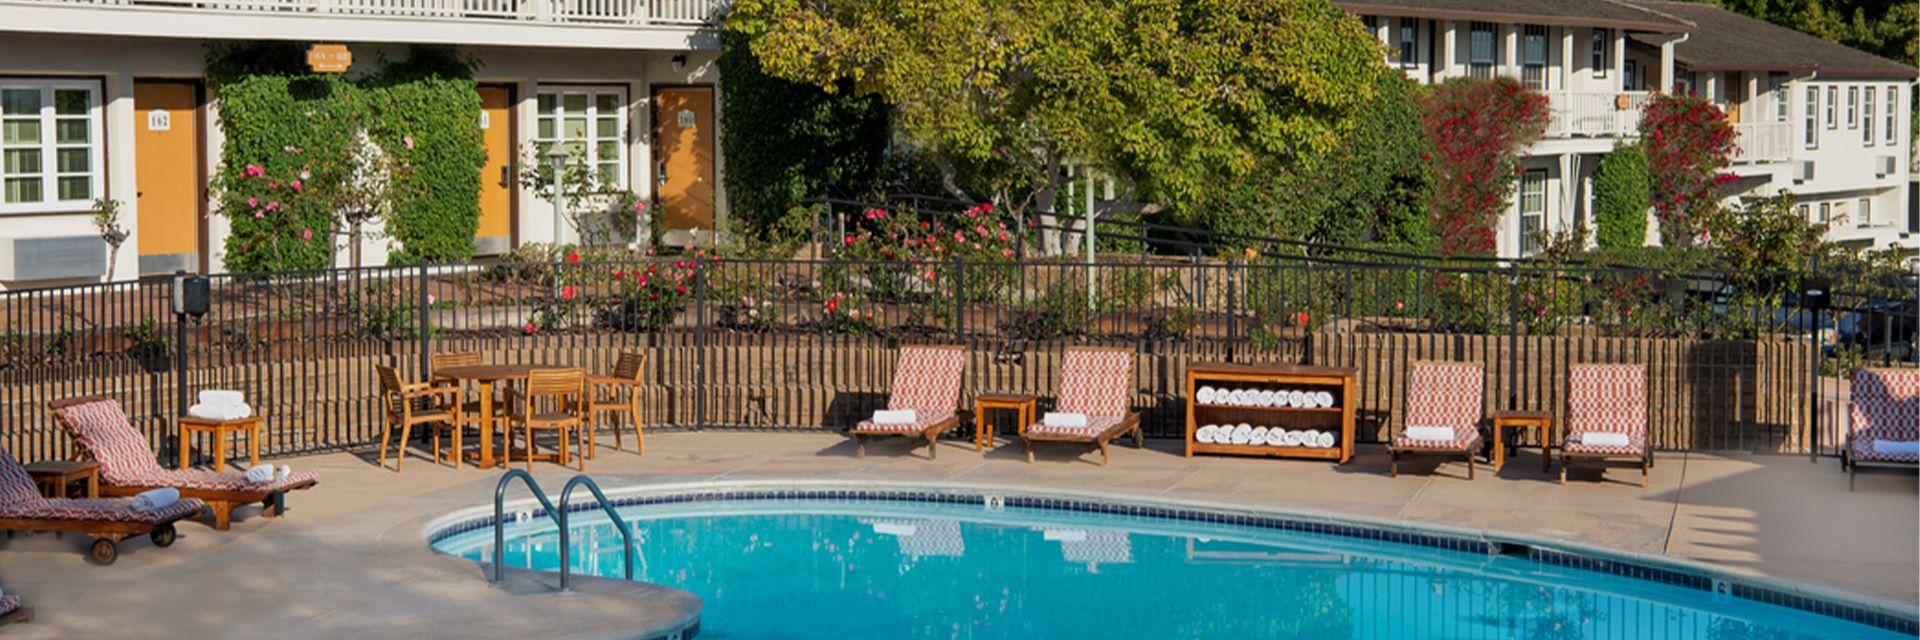 Casa Munras Garden Hotel & Spa, Monterey History